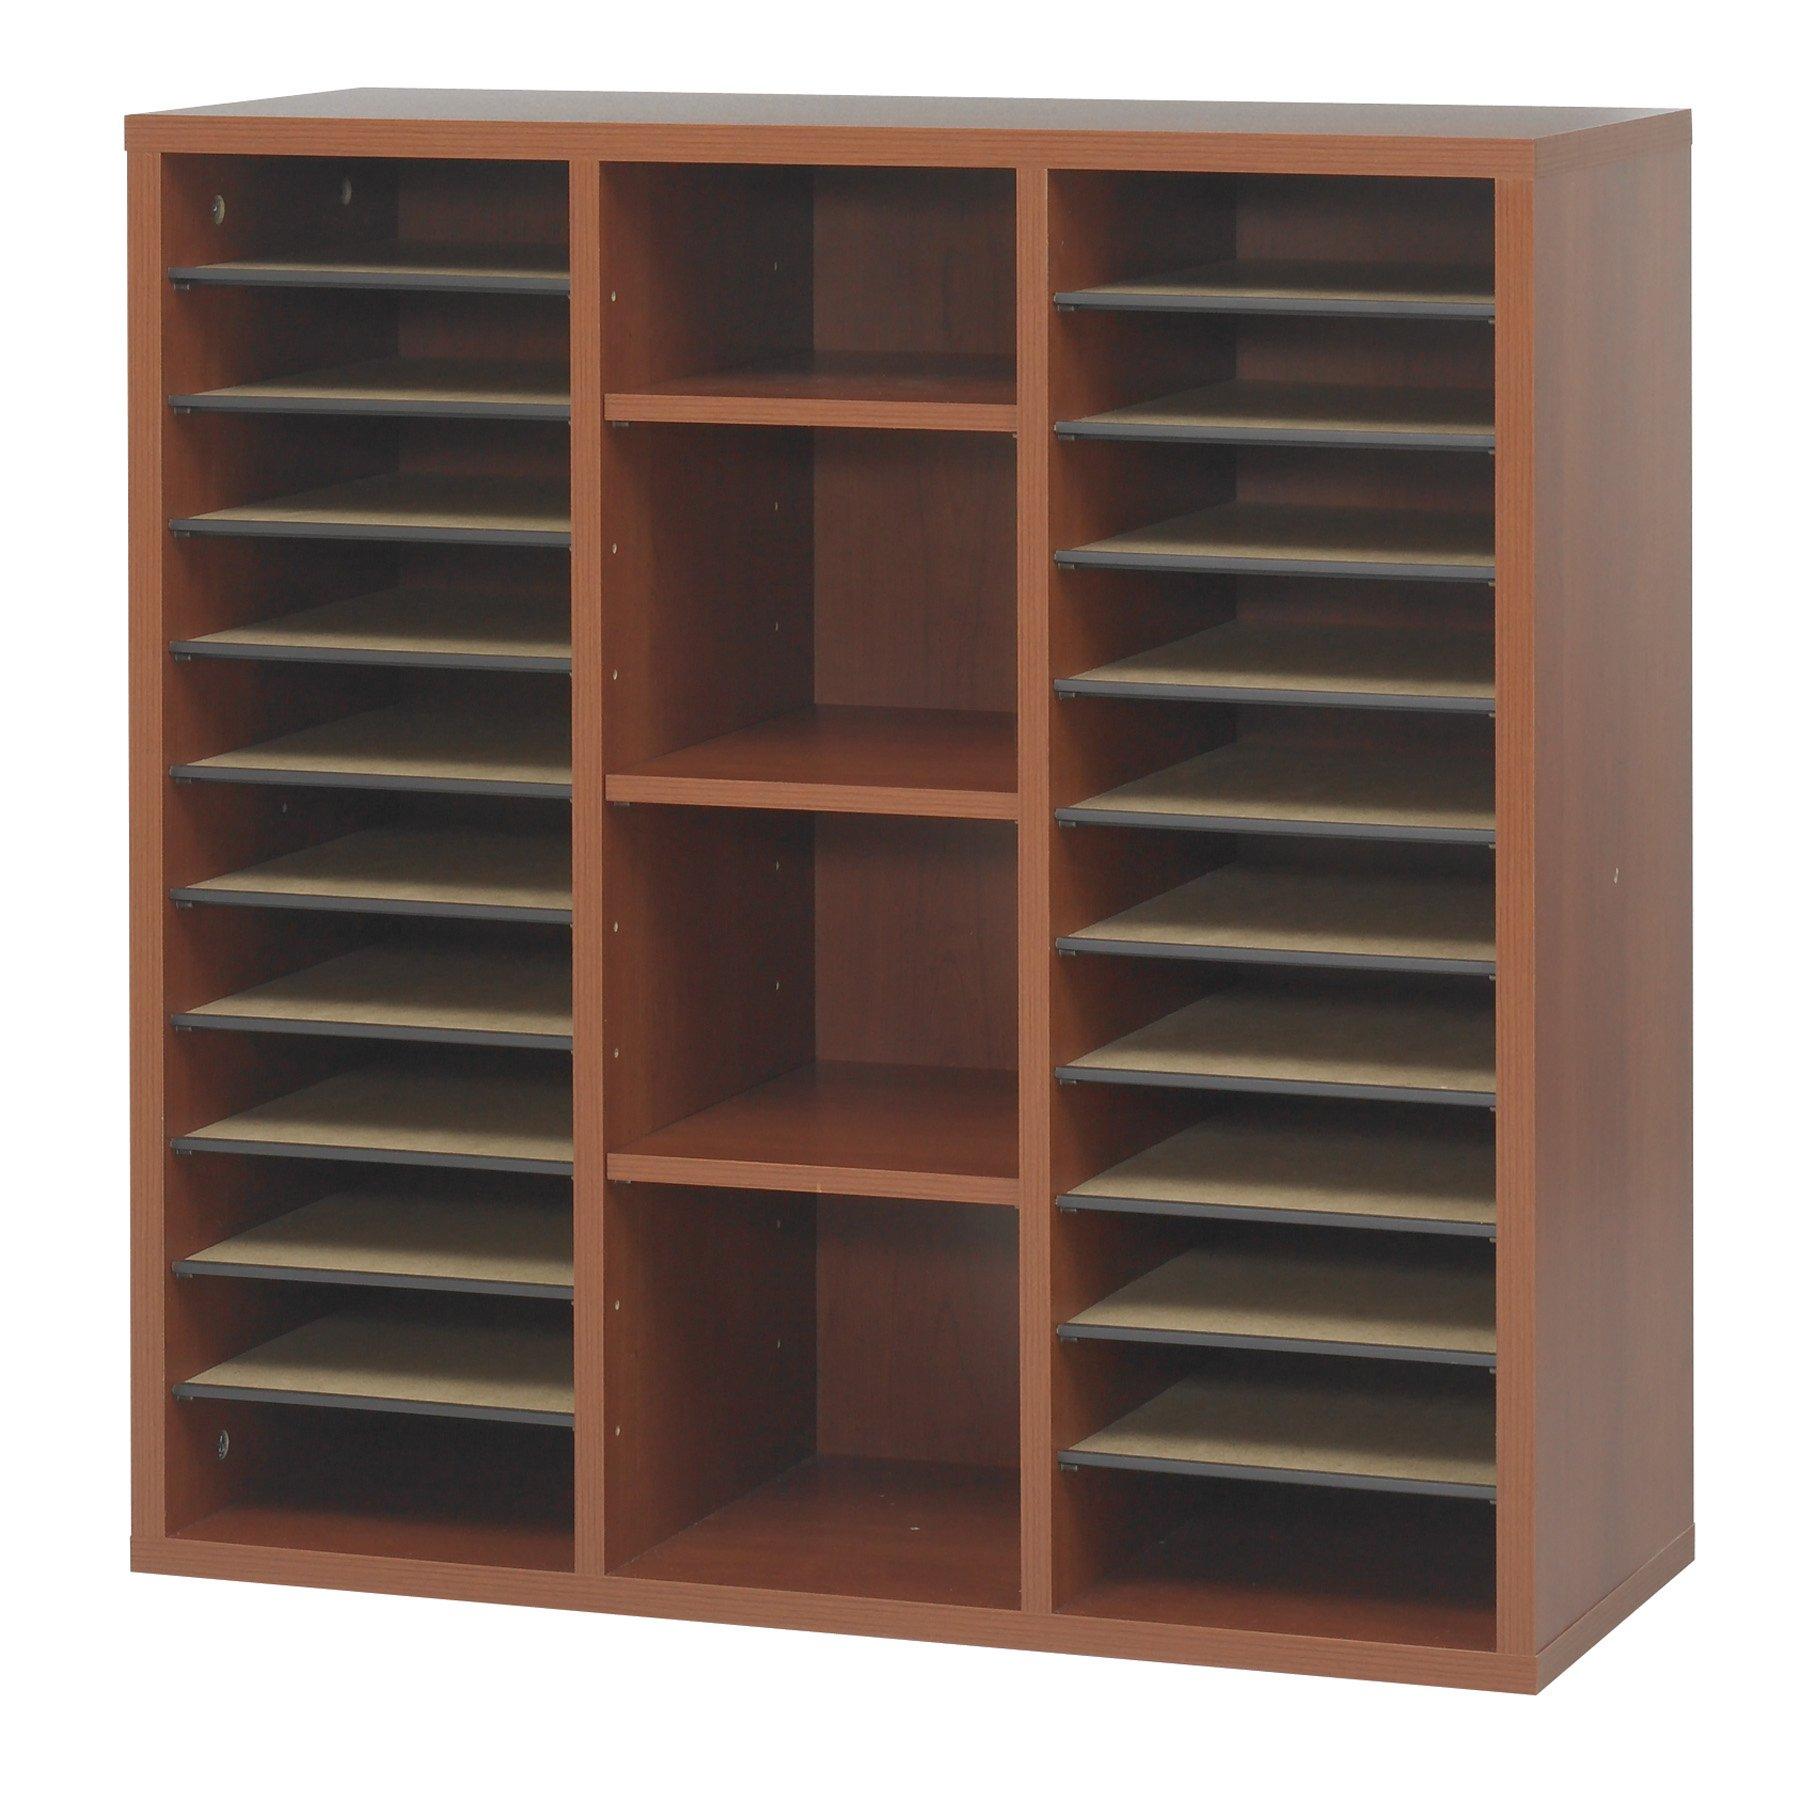 Safco Products 9441CY Apres Modular Storage Literature Organizer, Cherry